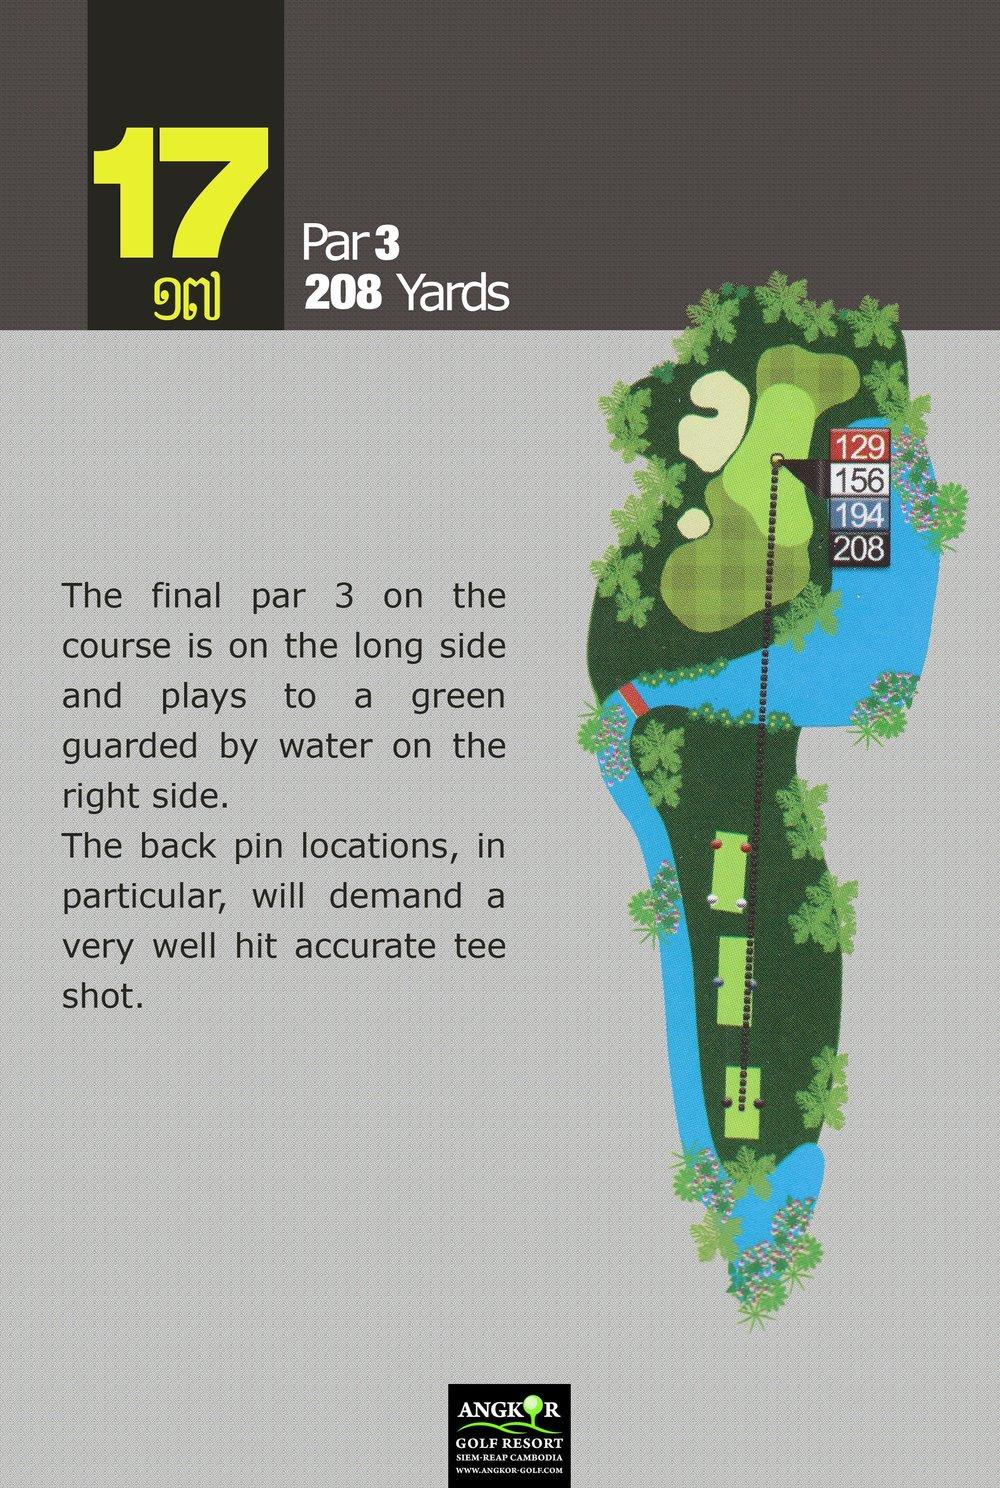 Hole 17 - Par 3 208 Yards